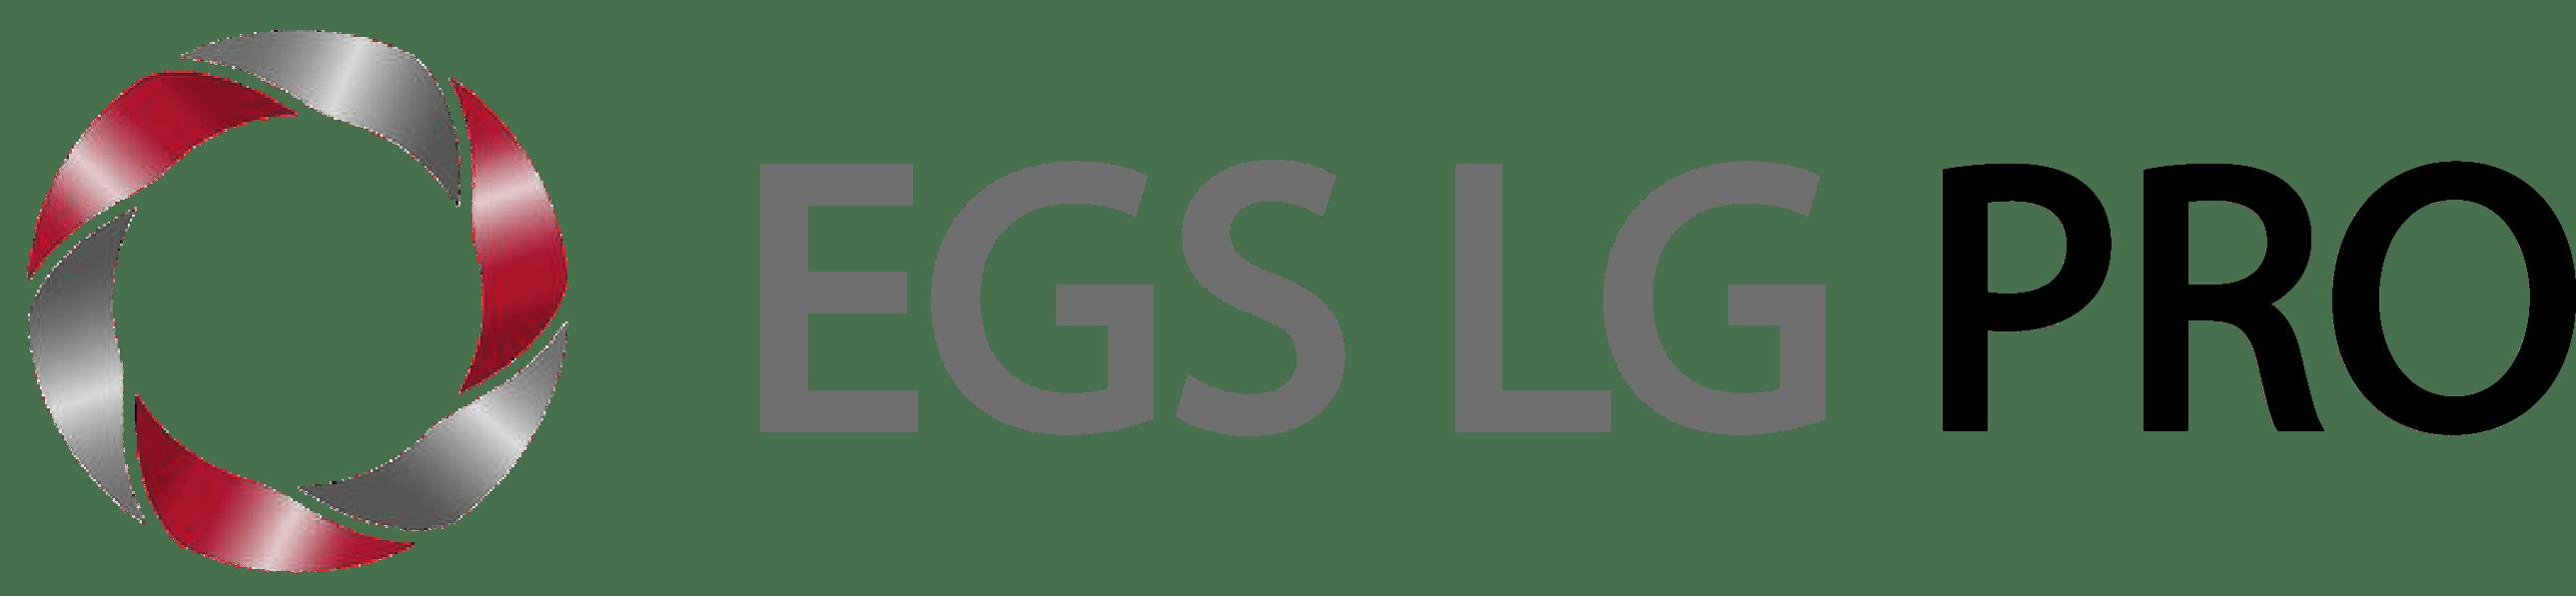 LG pro partner milano